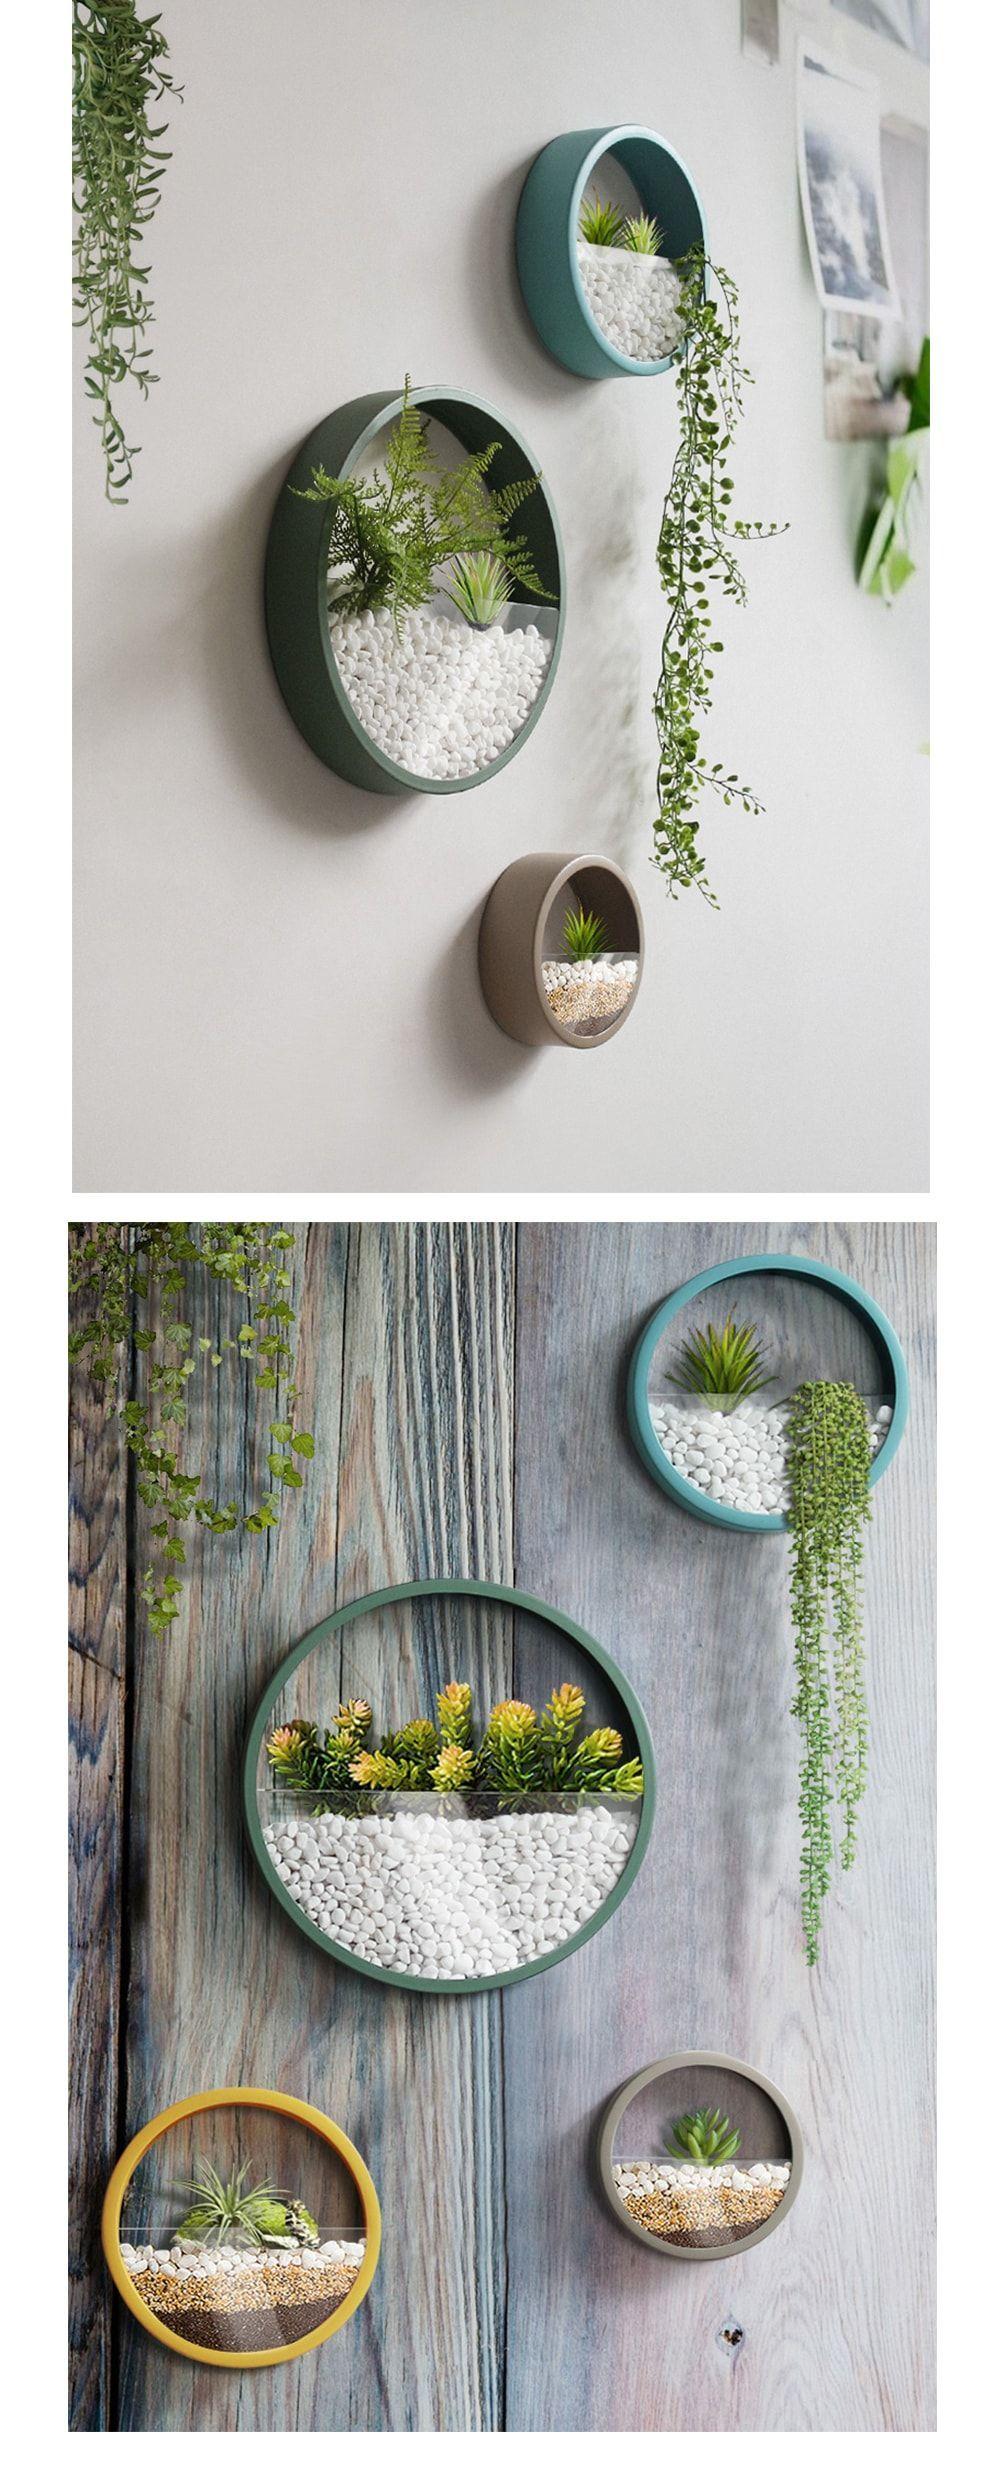 8 creations wall decor designs wall planter handmade